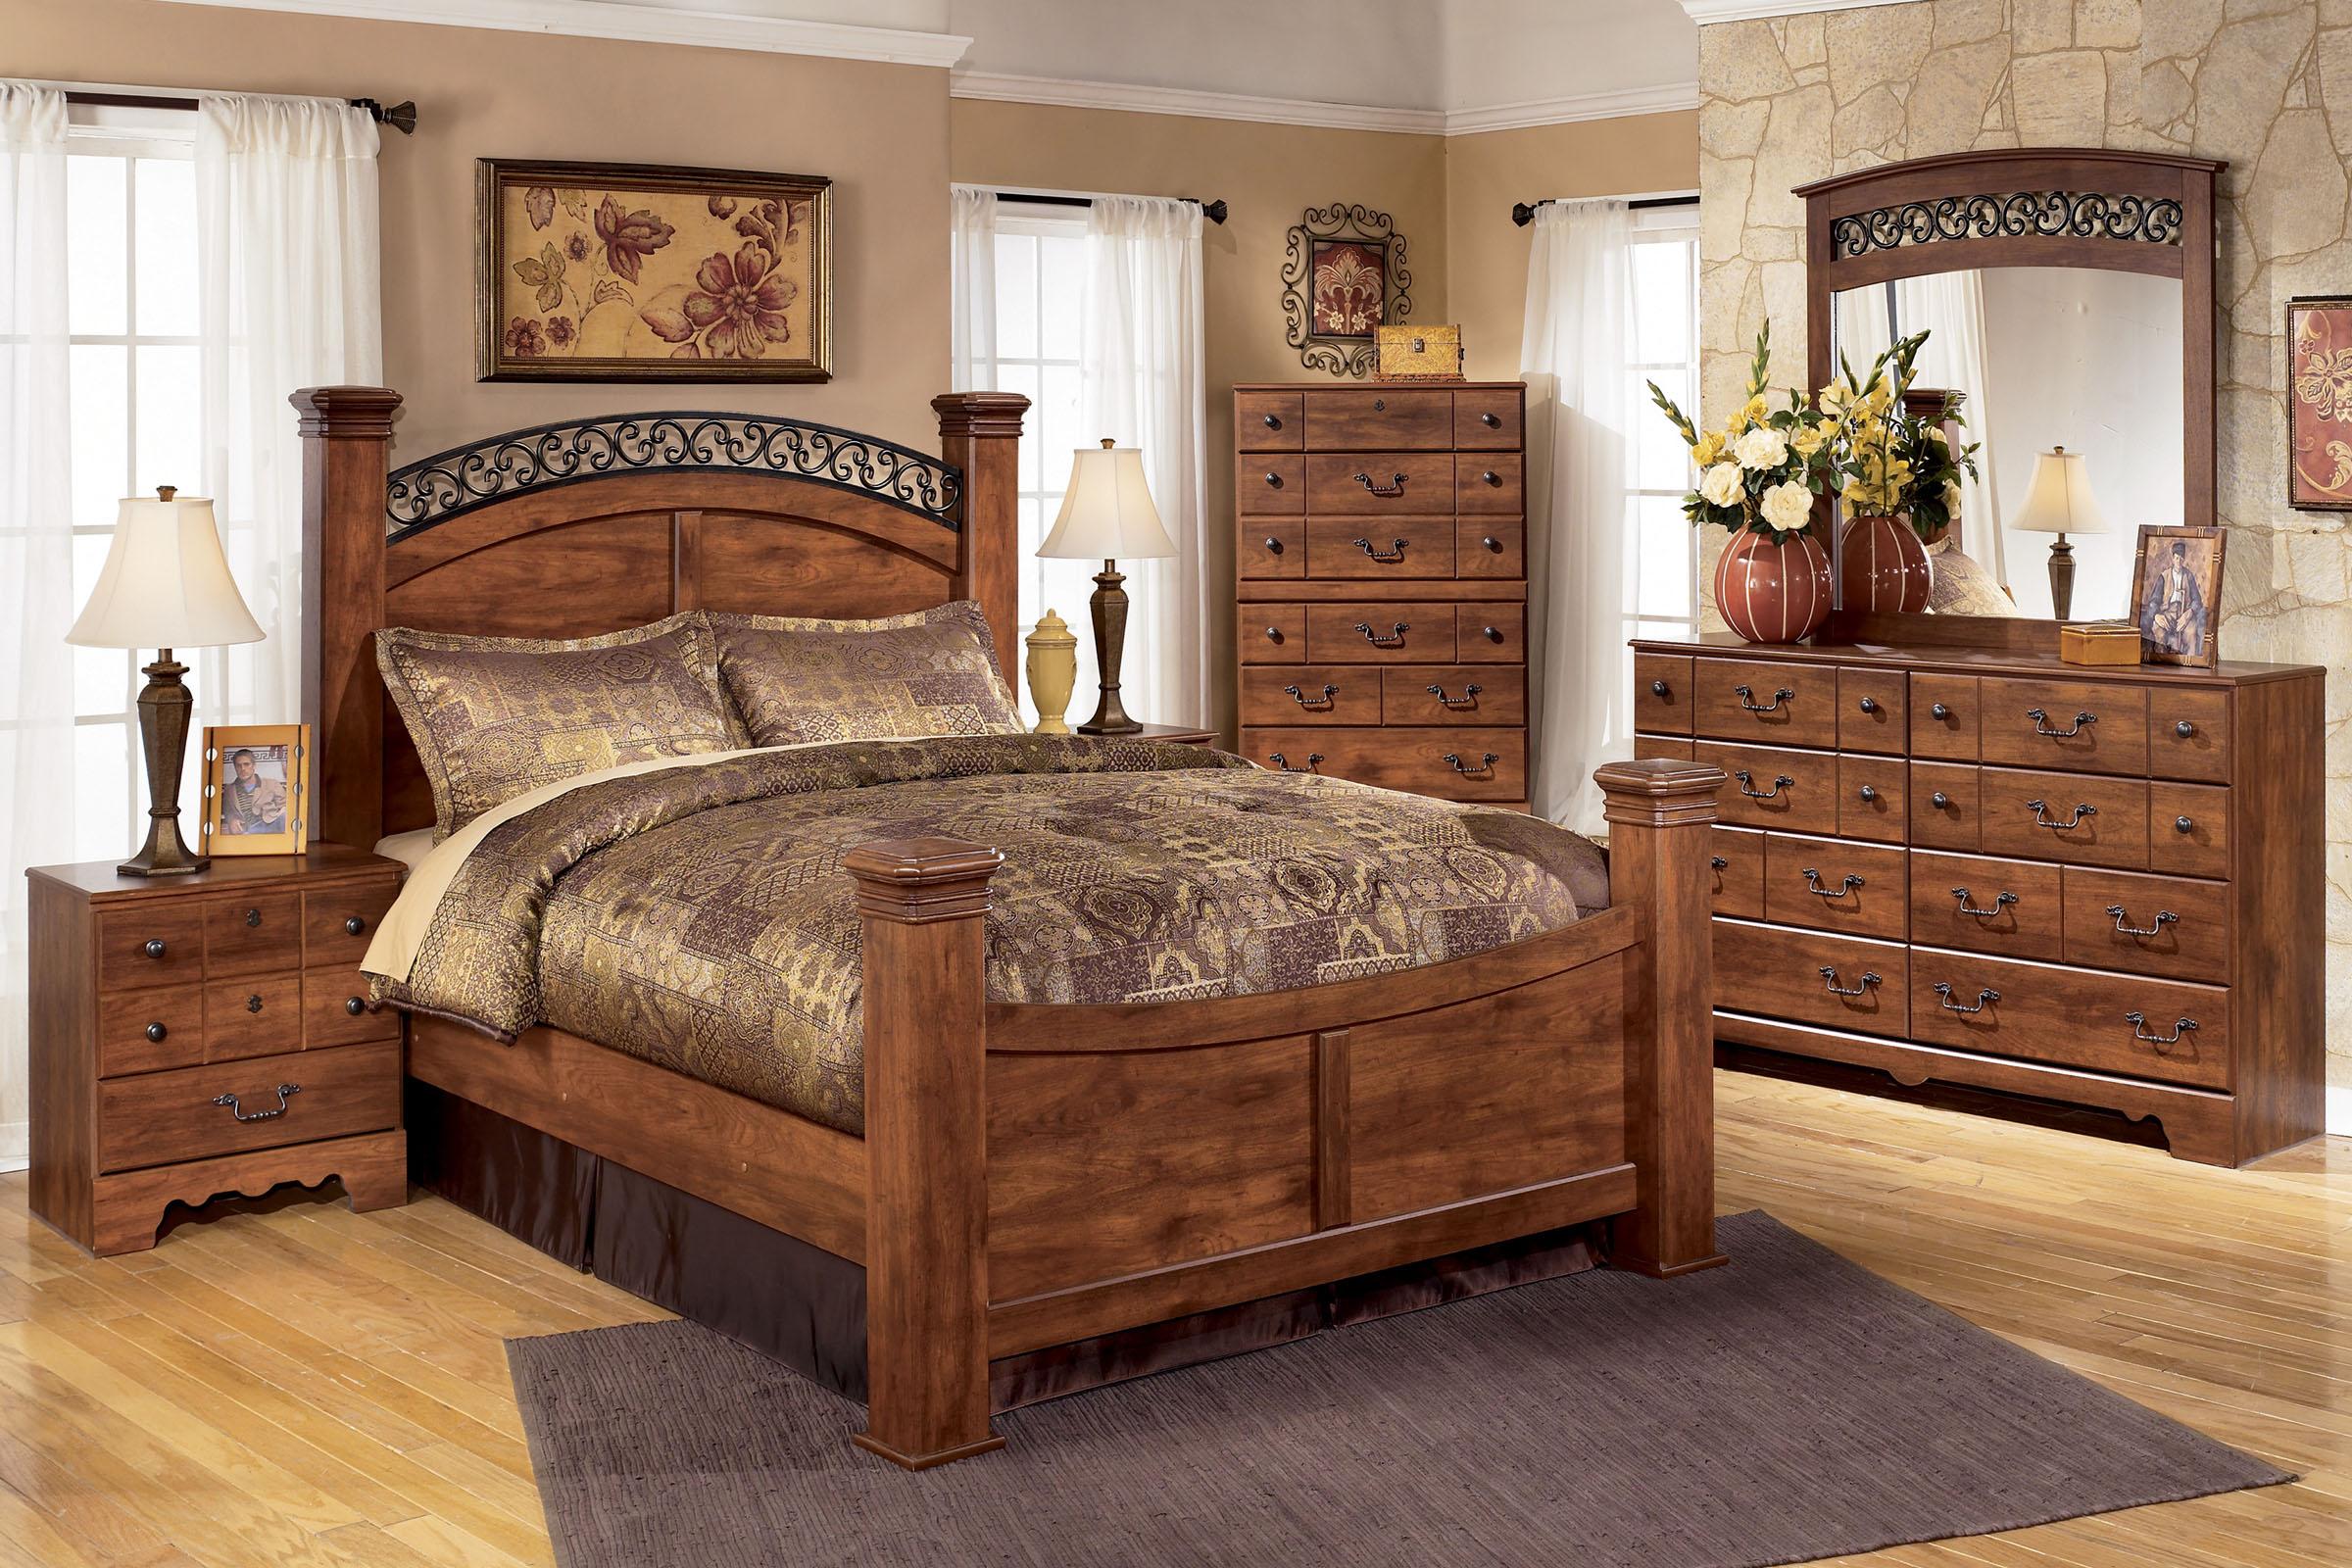 gardner white bedroom furniture home design inspirations